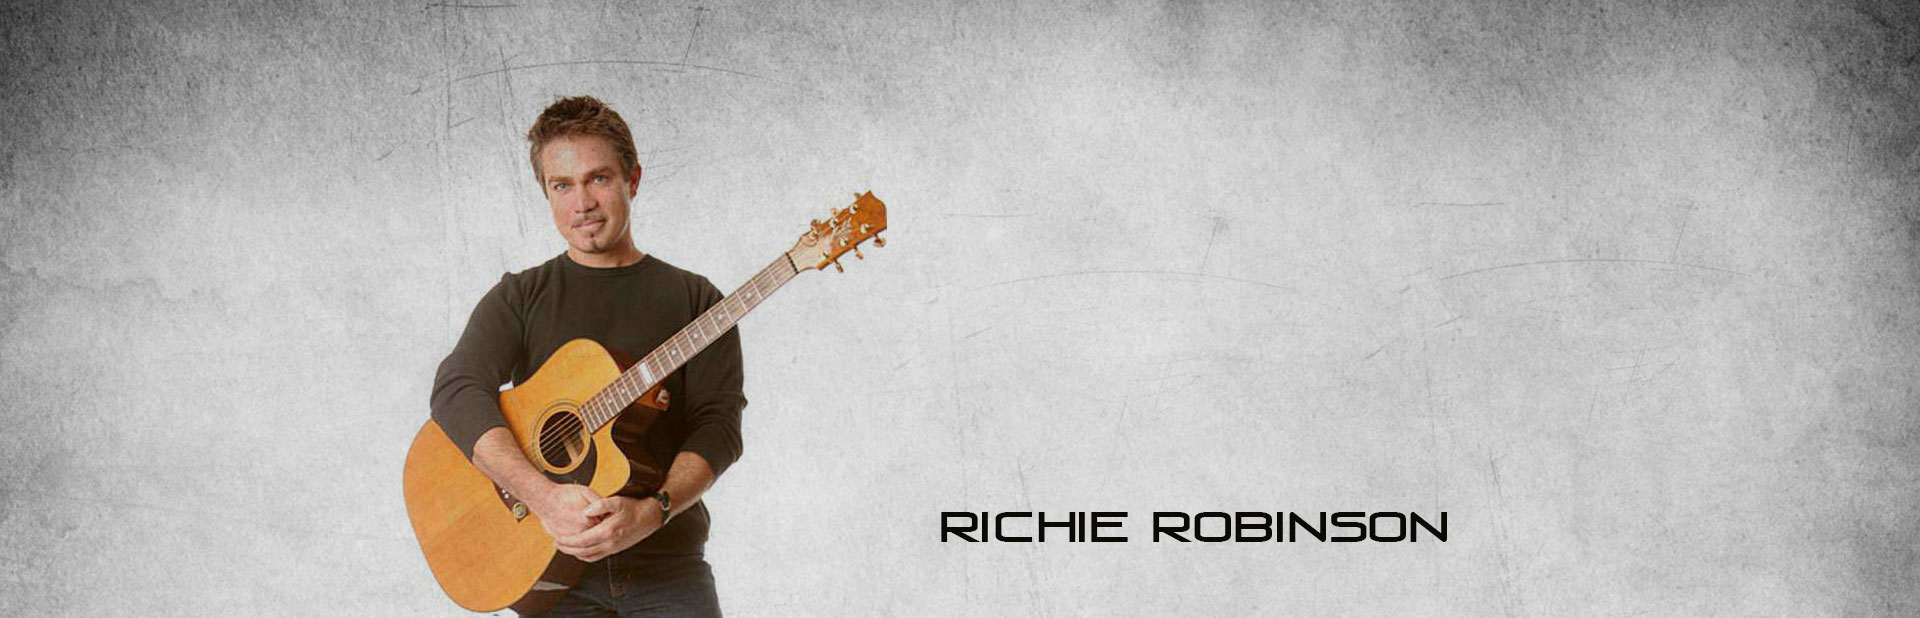 Richie Robinson